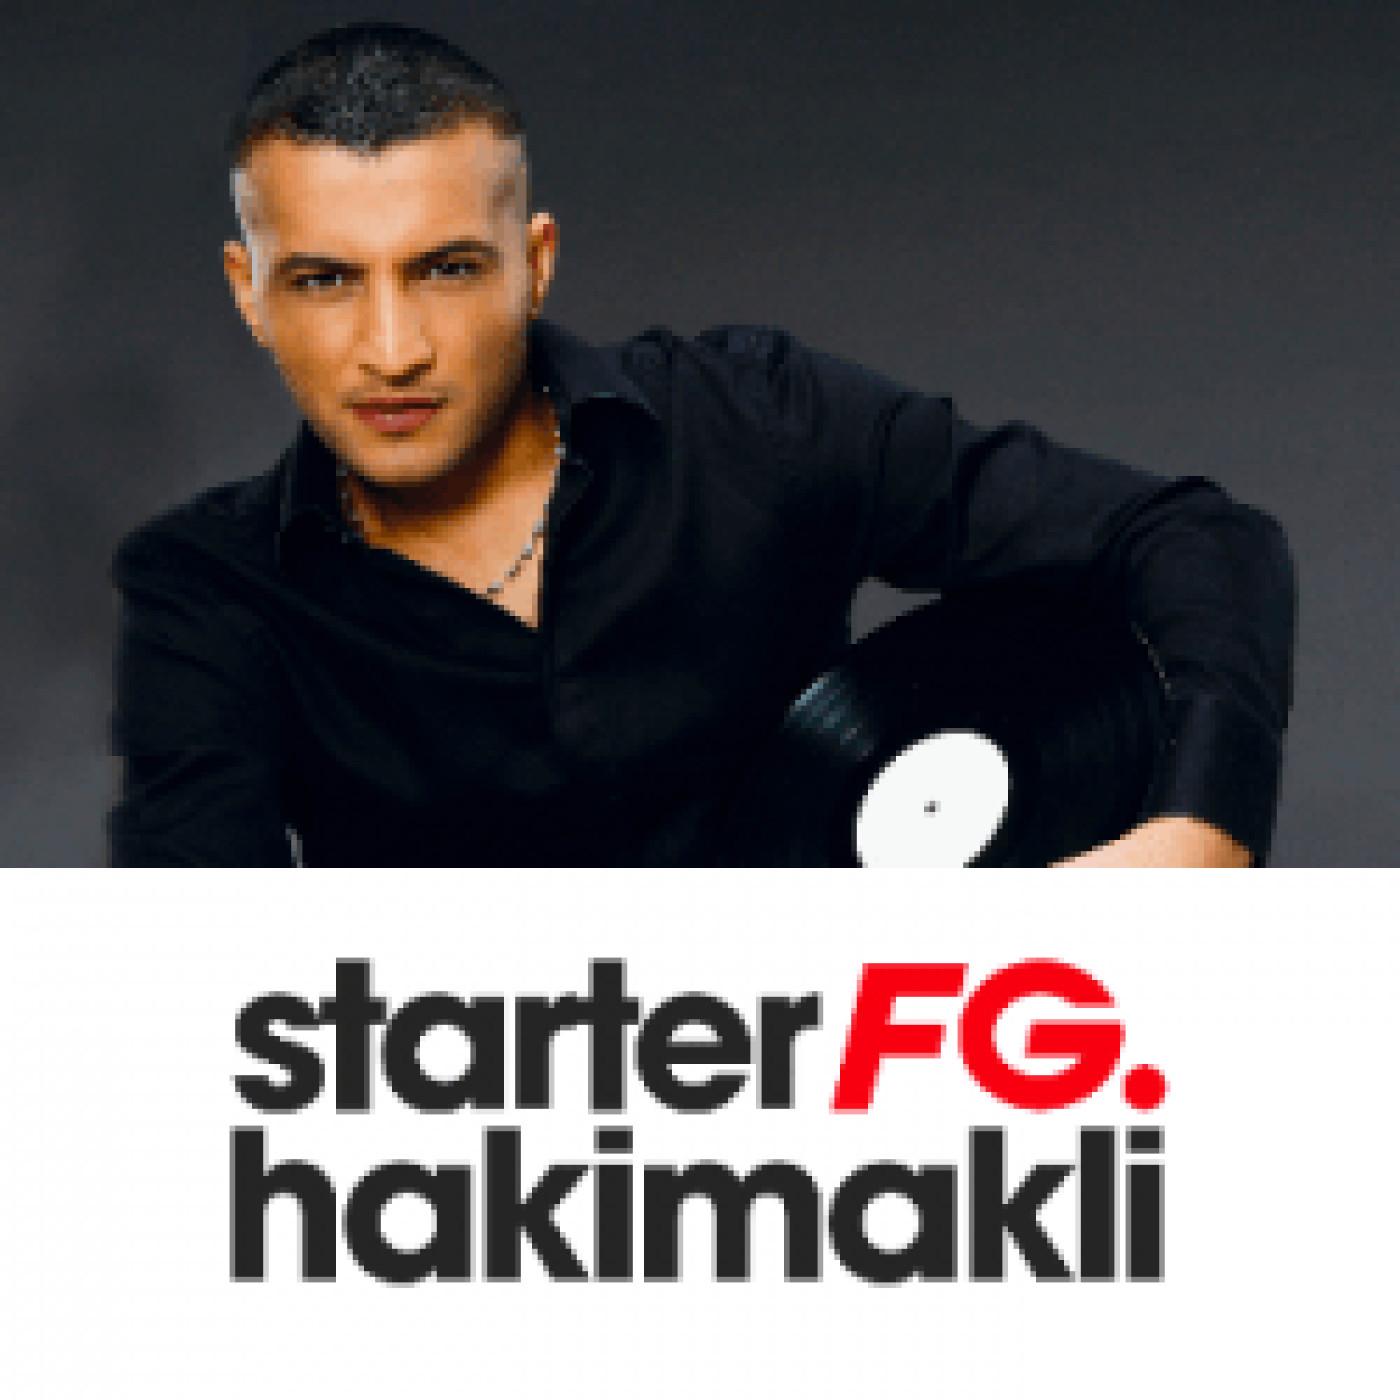 STARTER FG BY HAKIMAKLI MARDI 17 NOVEMBRE 2020